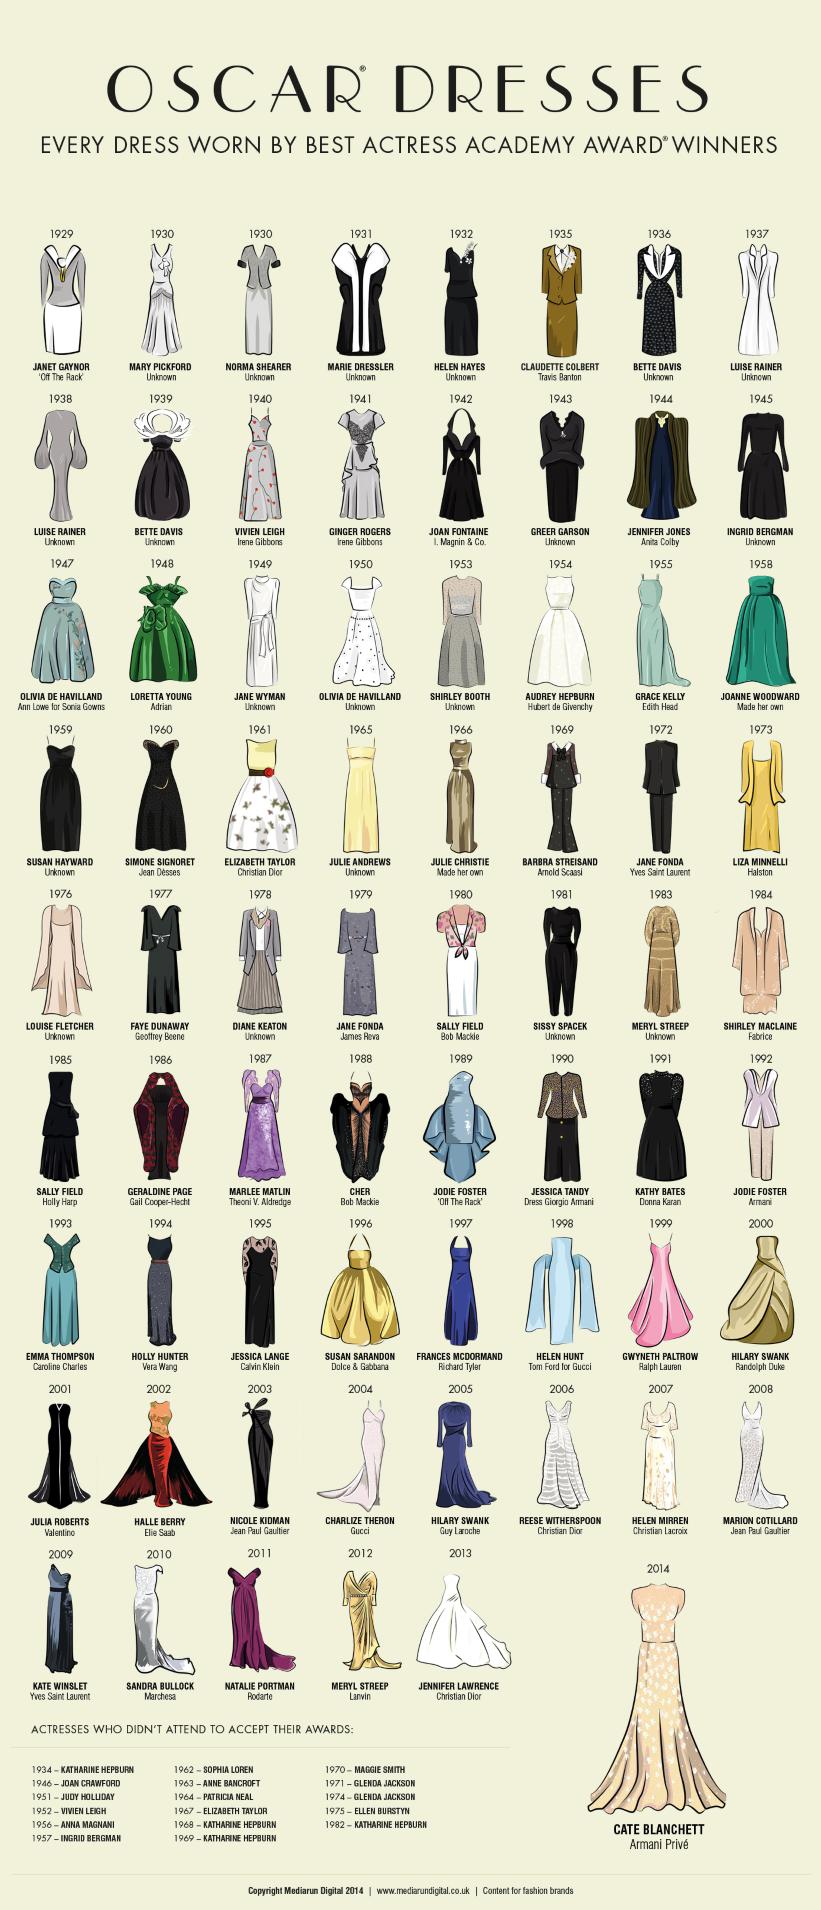 Oscar Dresses [Infographic]